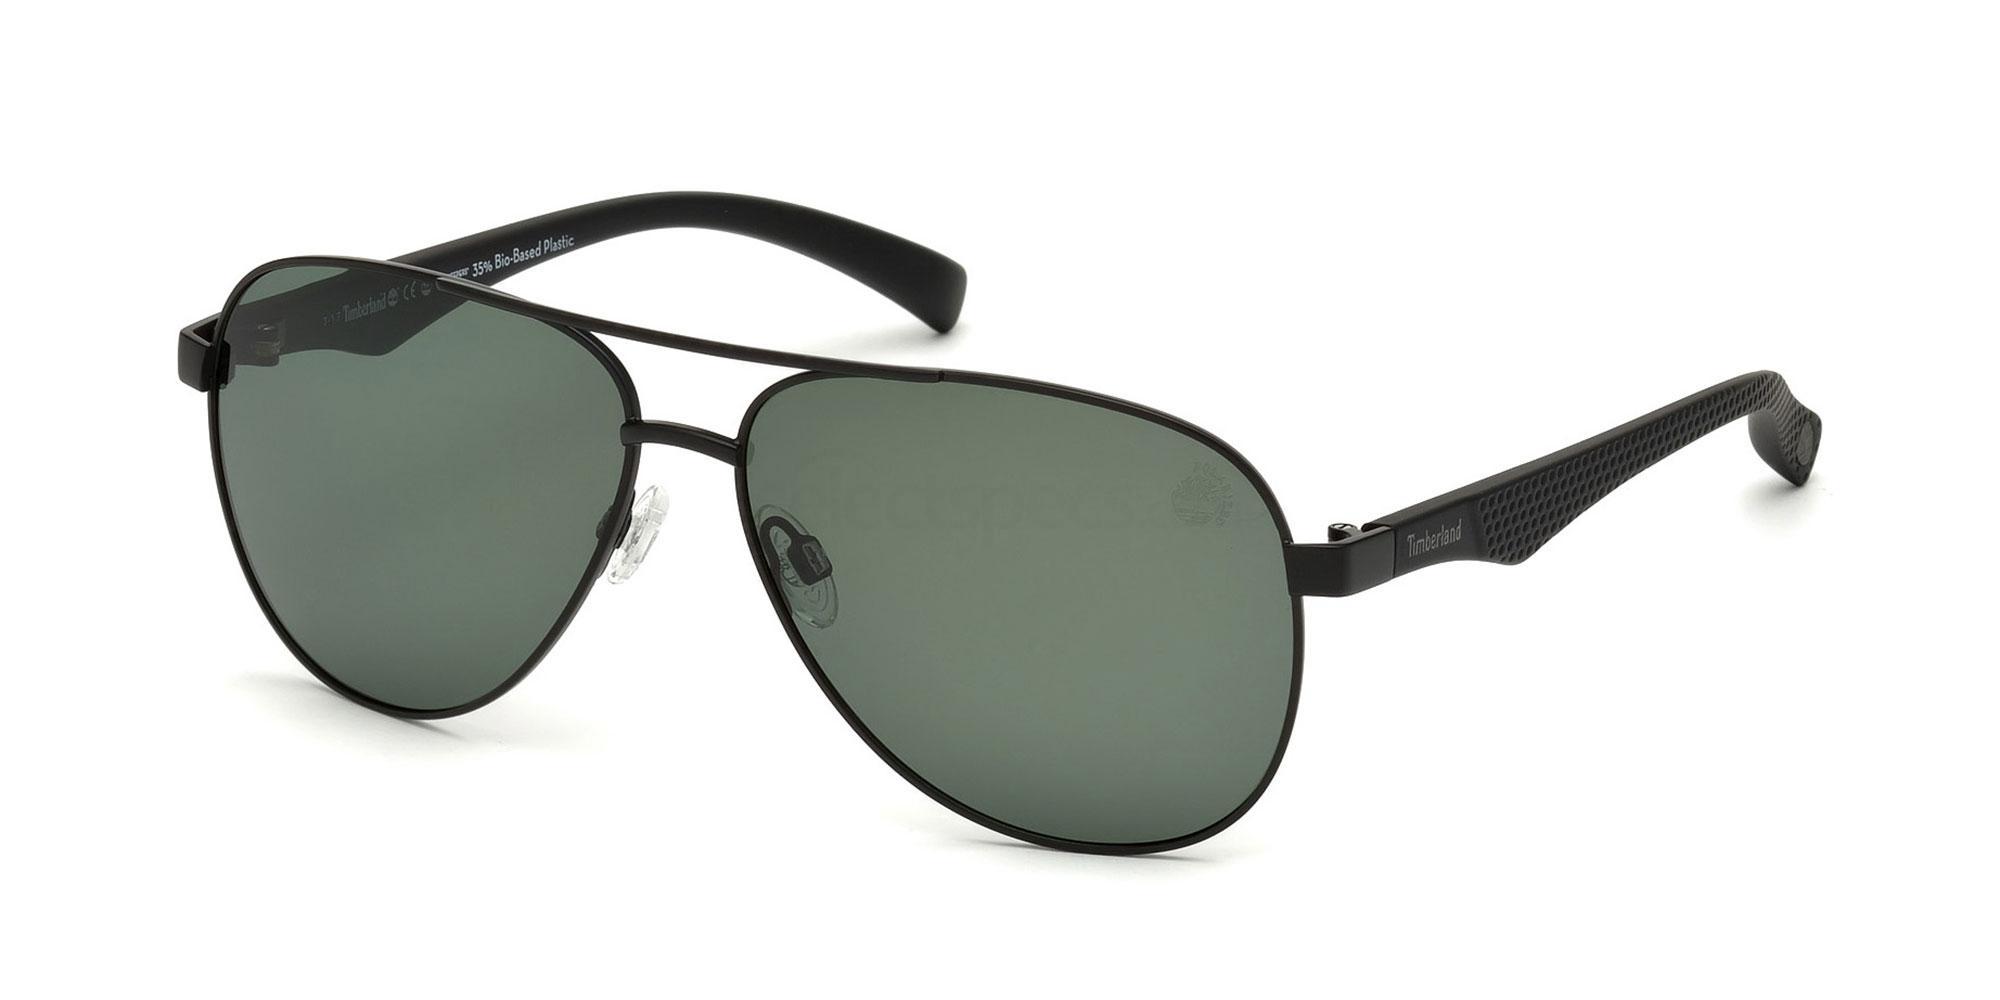 02R TB9137 Sunglasses, Timberland